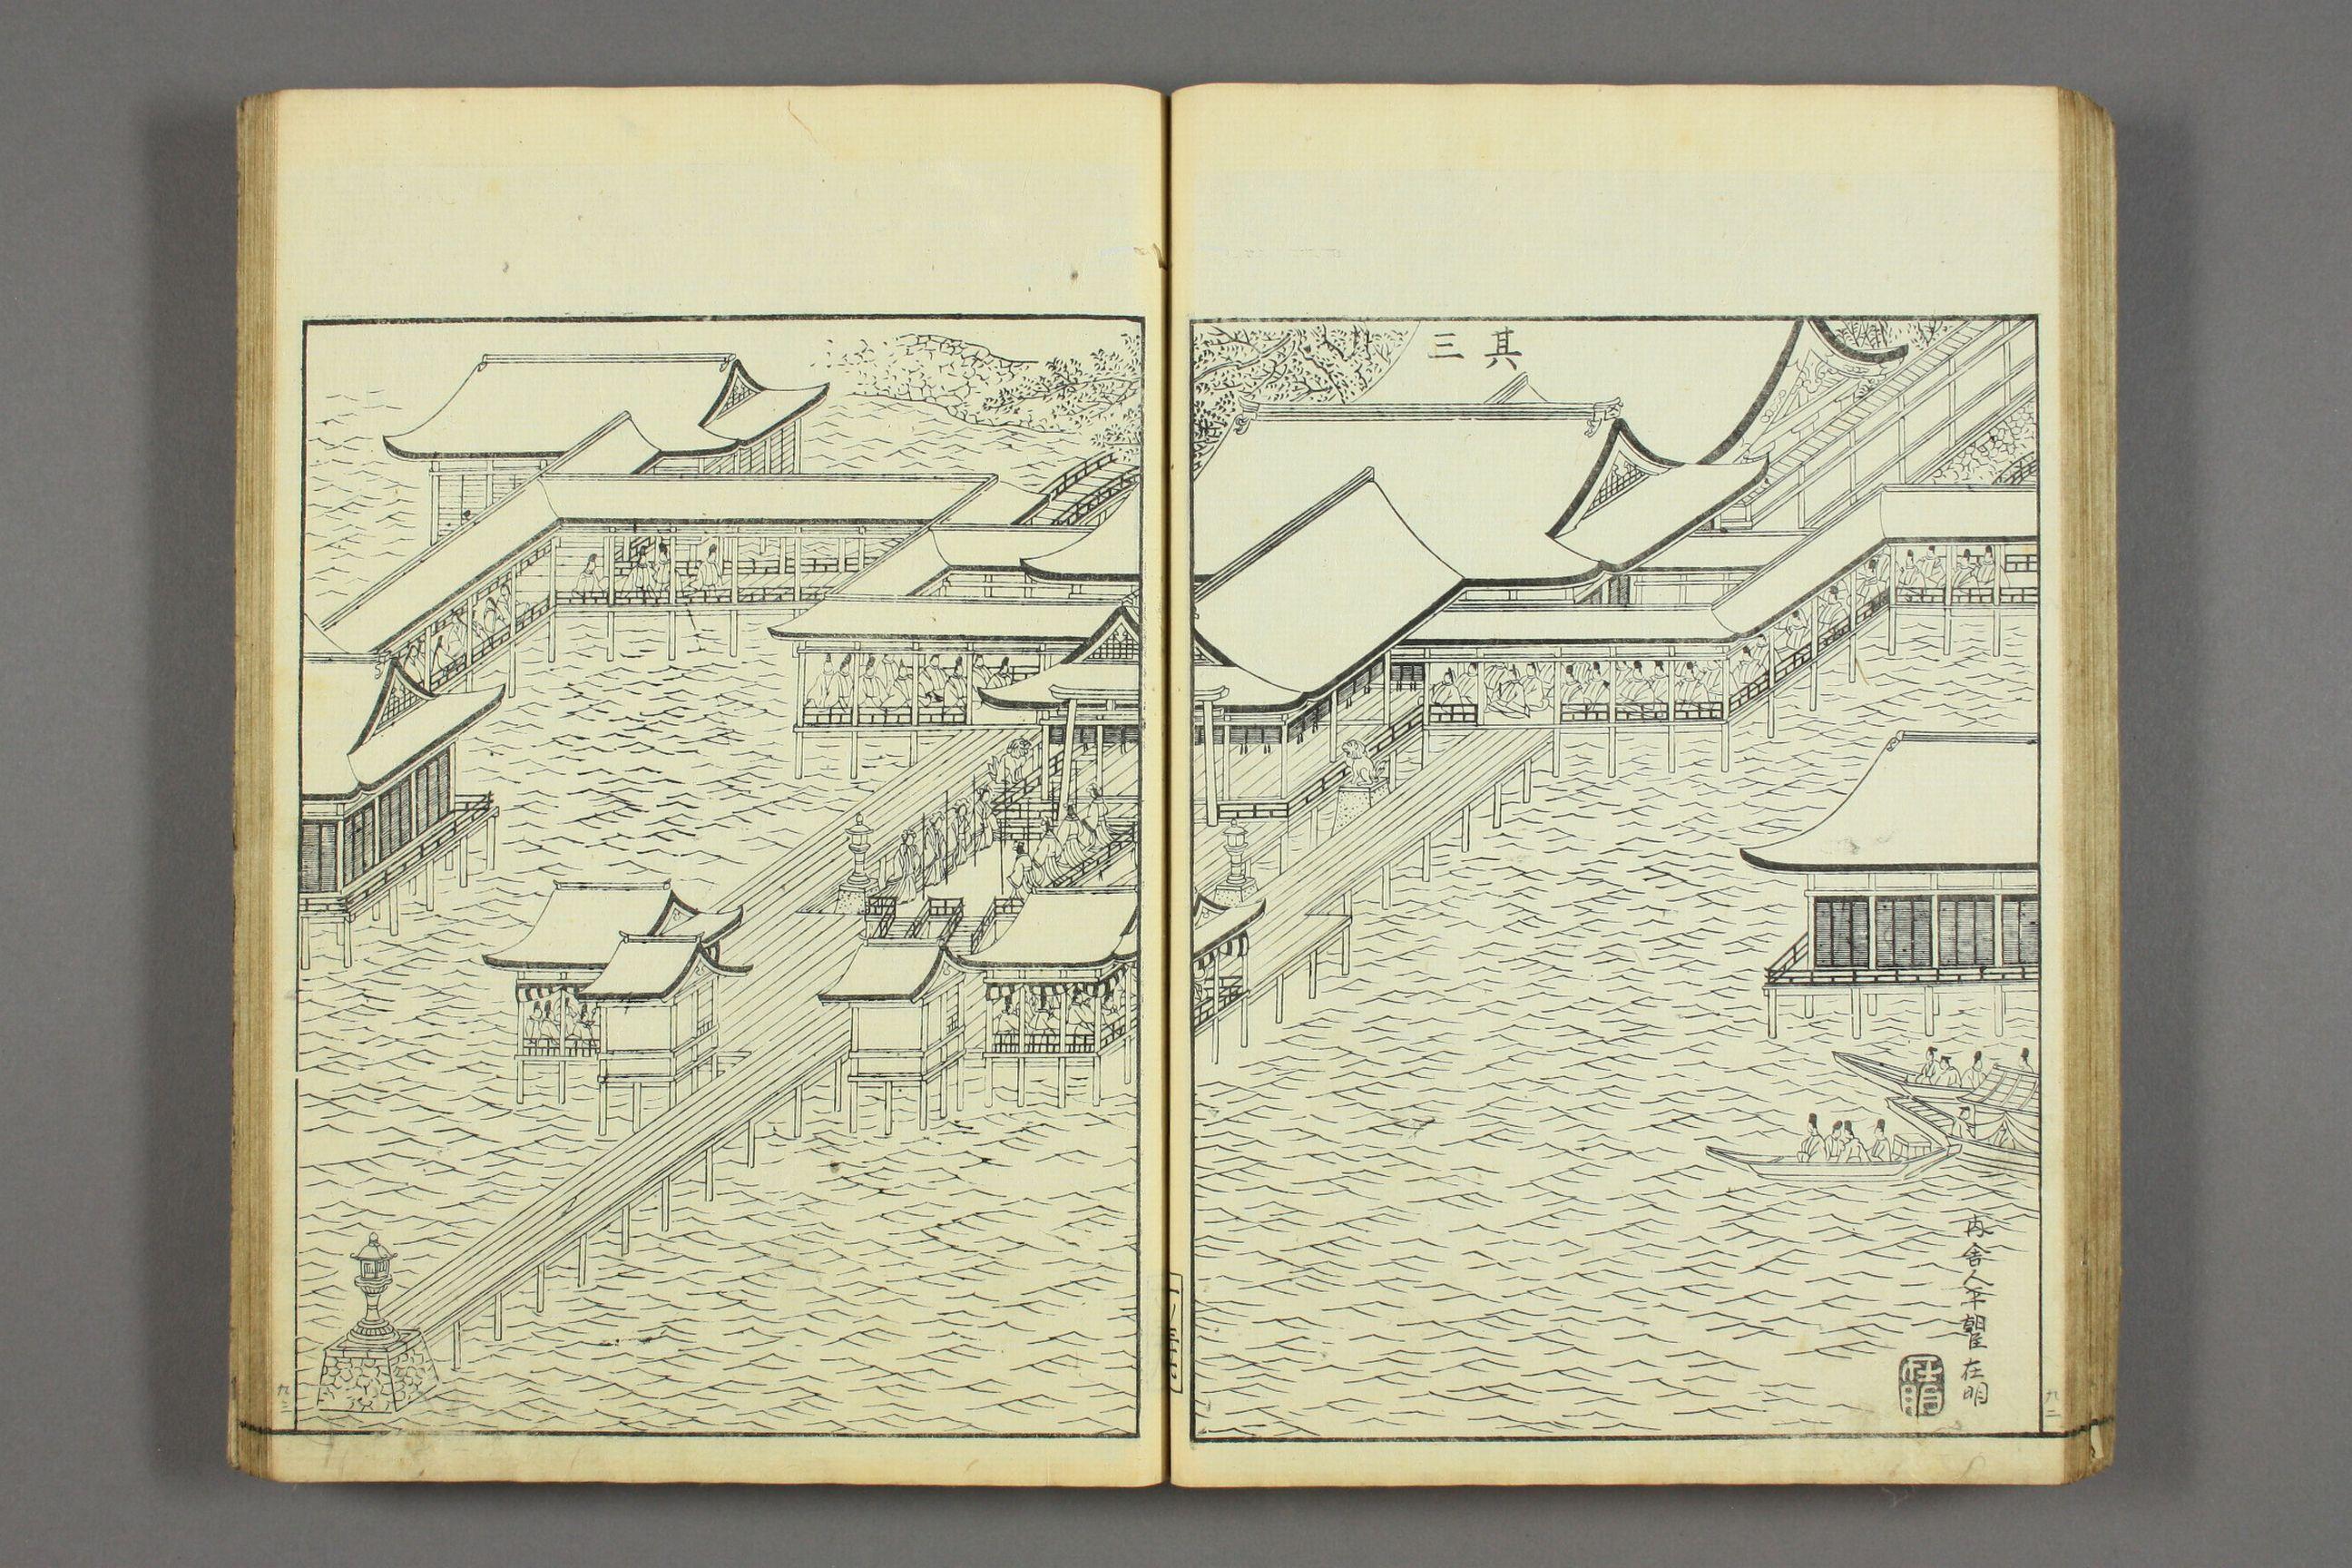 http://archive.wul.waseda.ac.jp/kosho/bunko30/bunko30_e0225/bunko30_e0225_0001/bunko30_e0225_0001_p0048.jpg